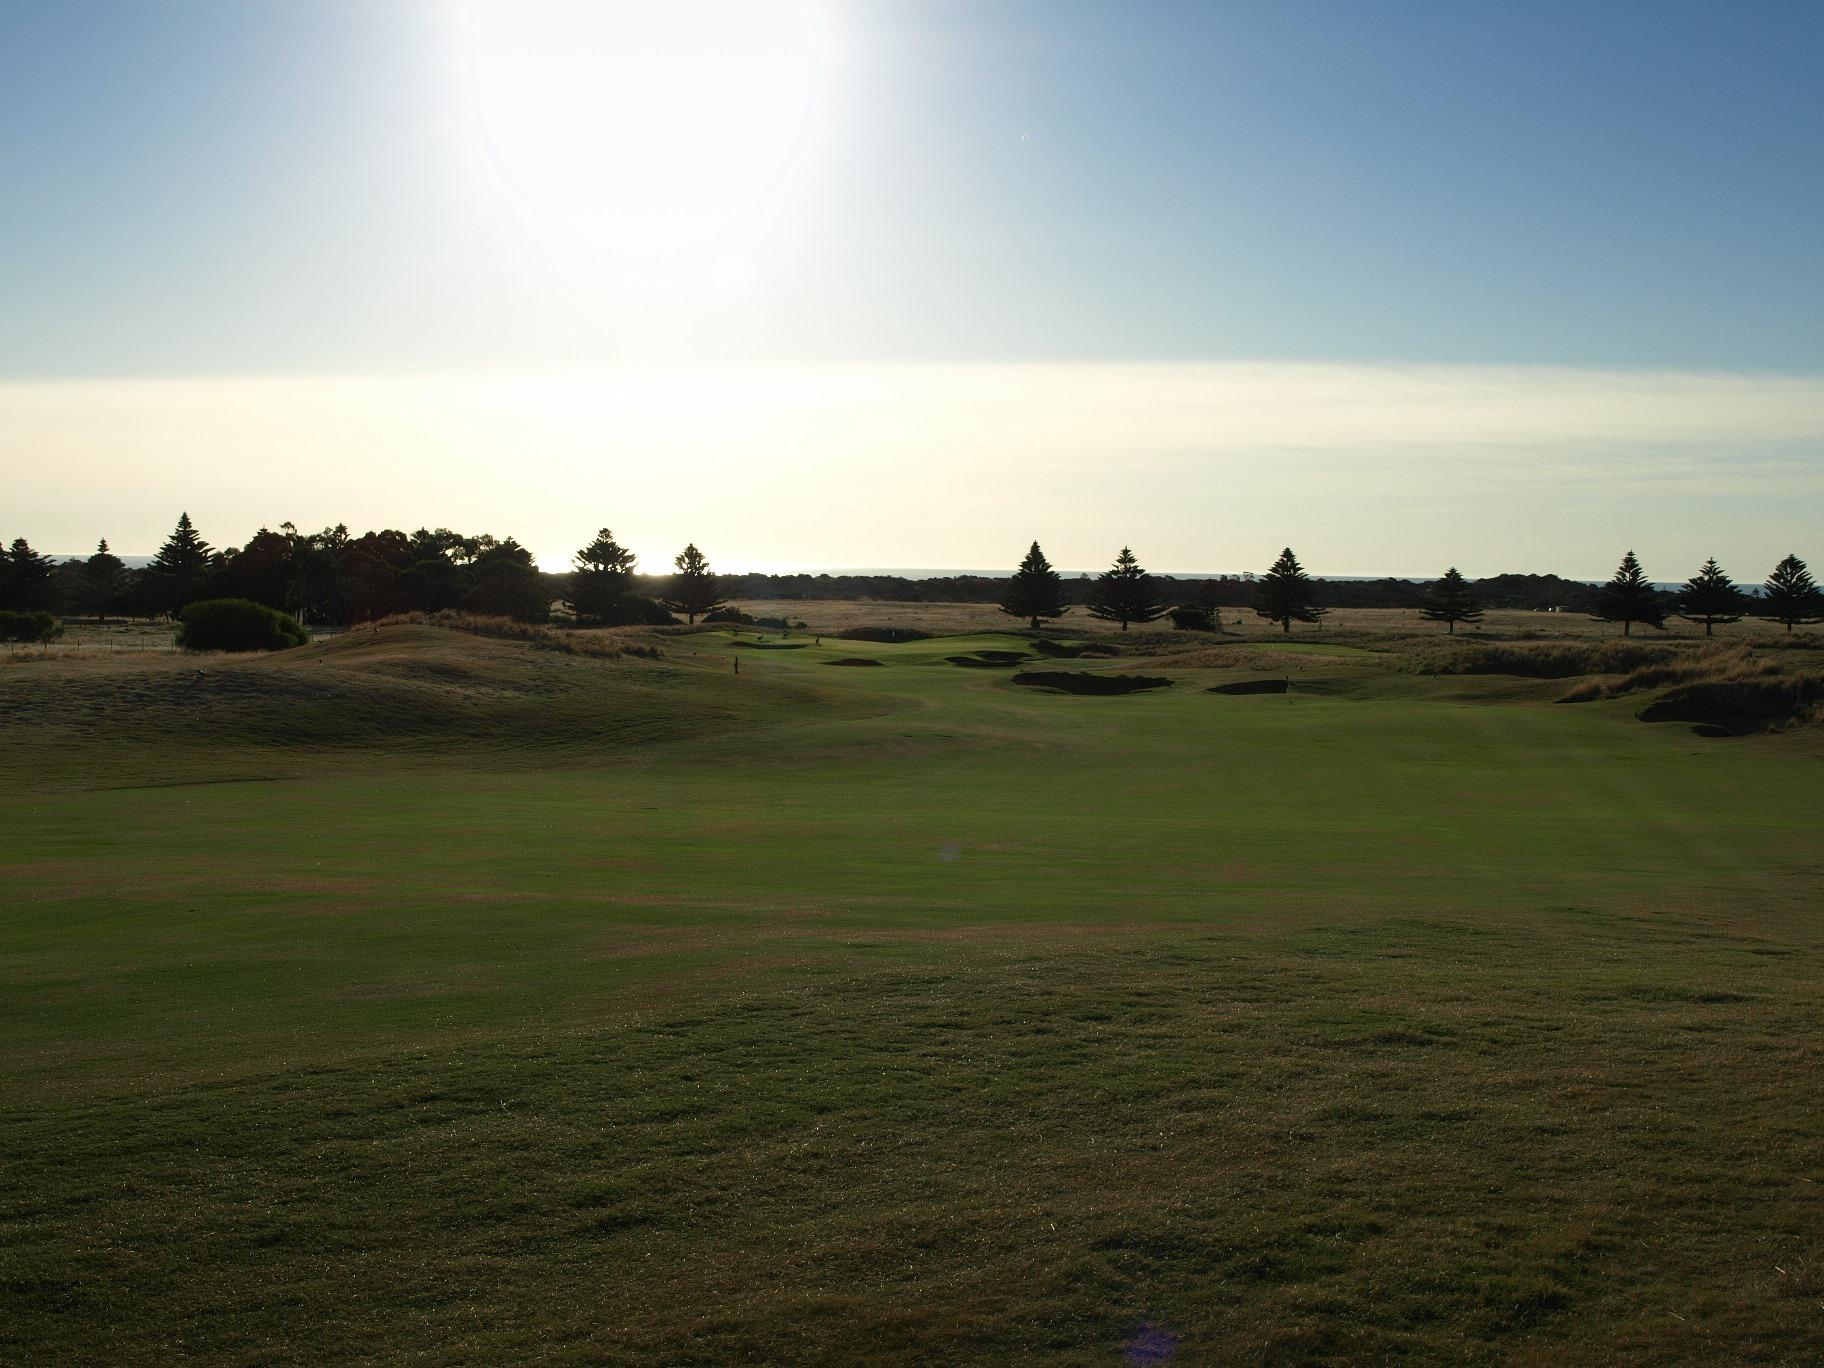 links lady bay golf resort 11th fairway aussie golf quest. Black Bedroom Furniture Sets. Home Design Ideas